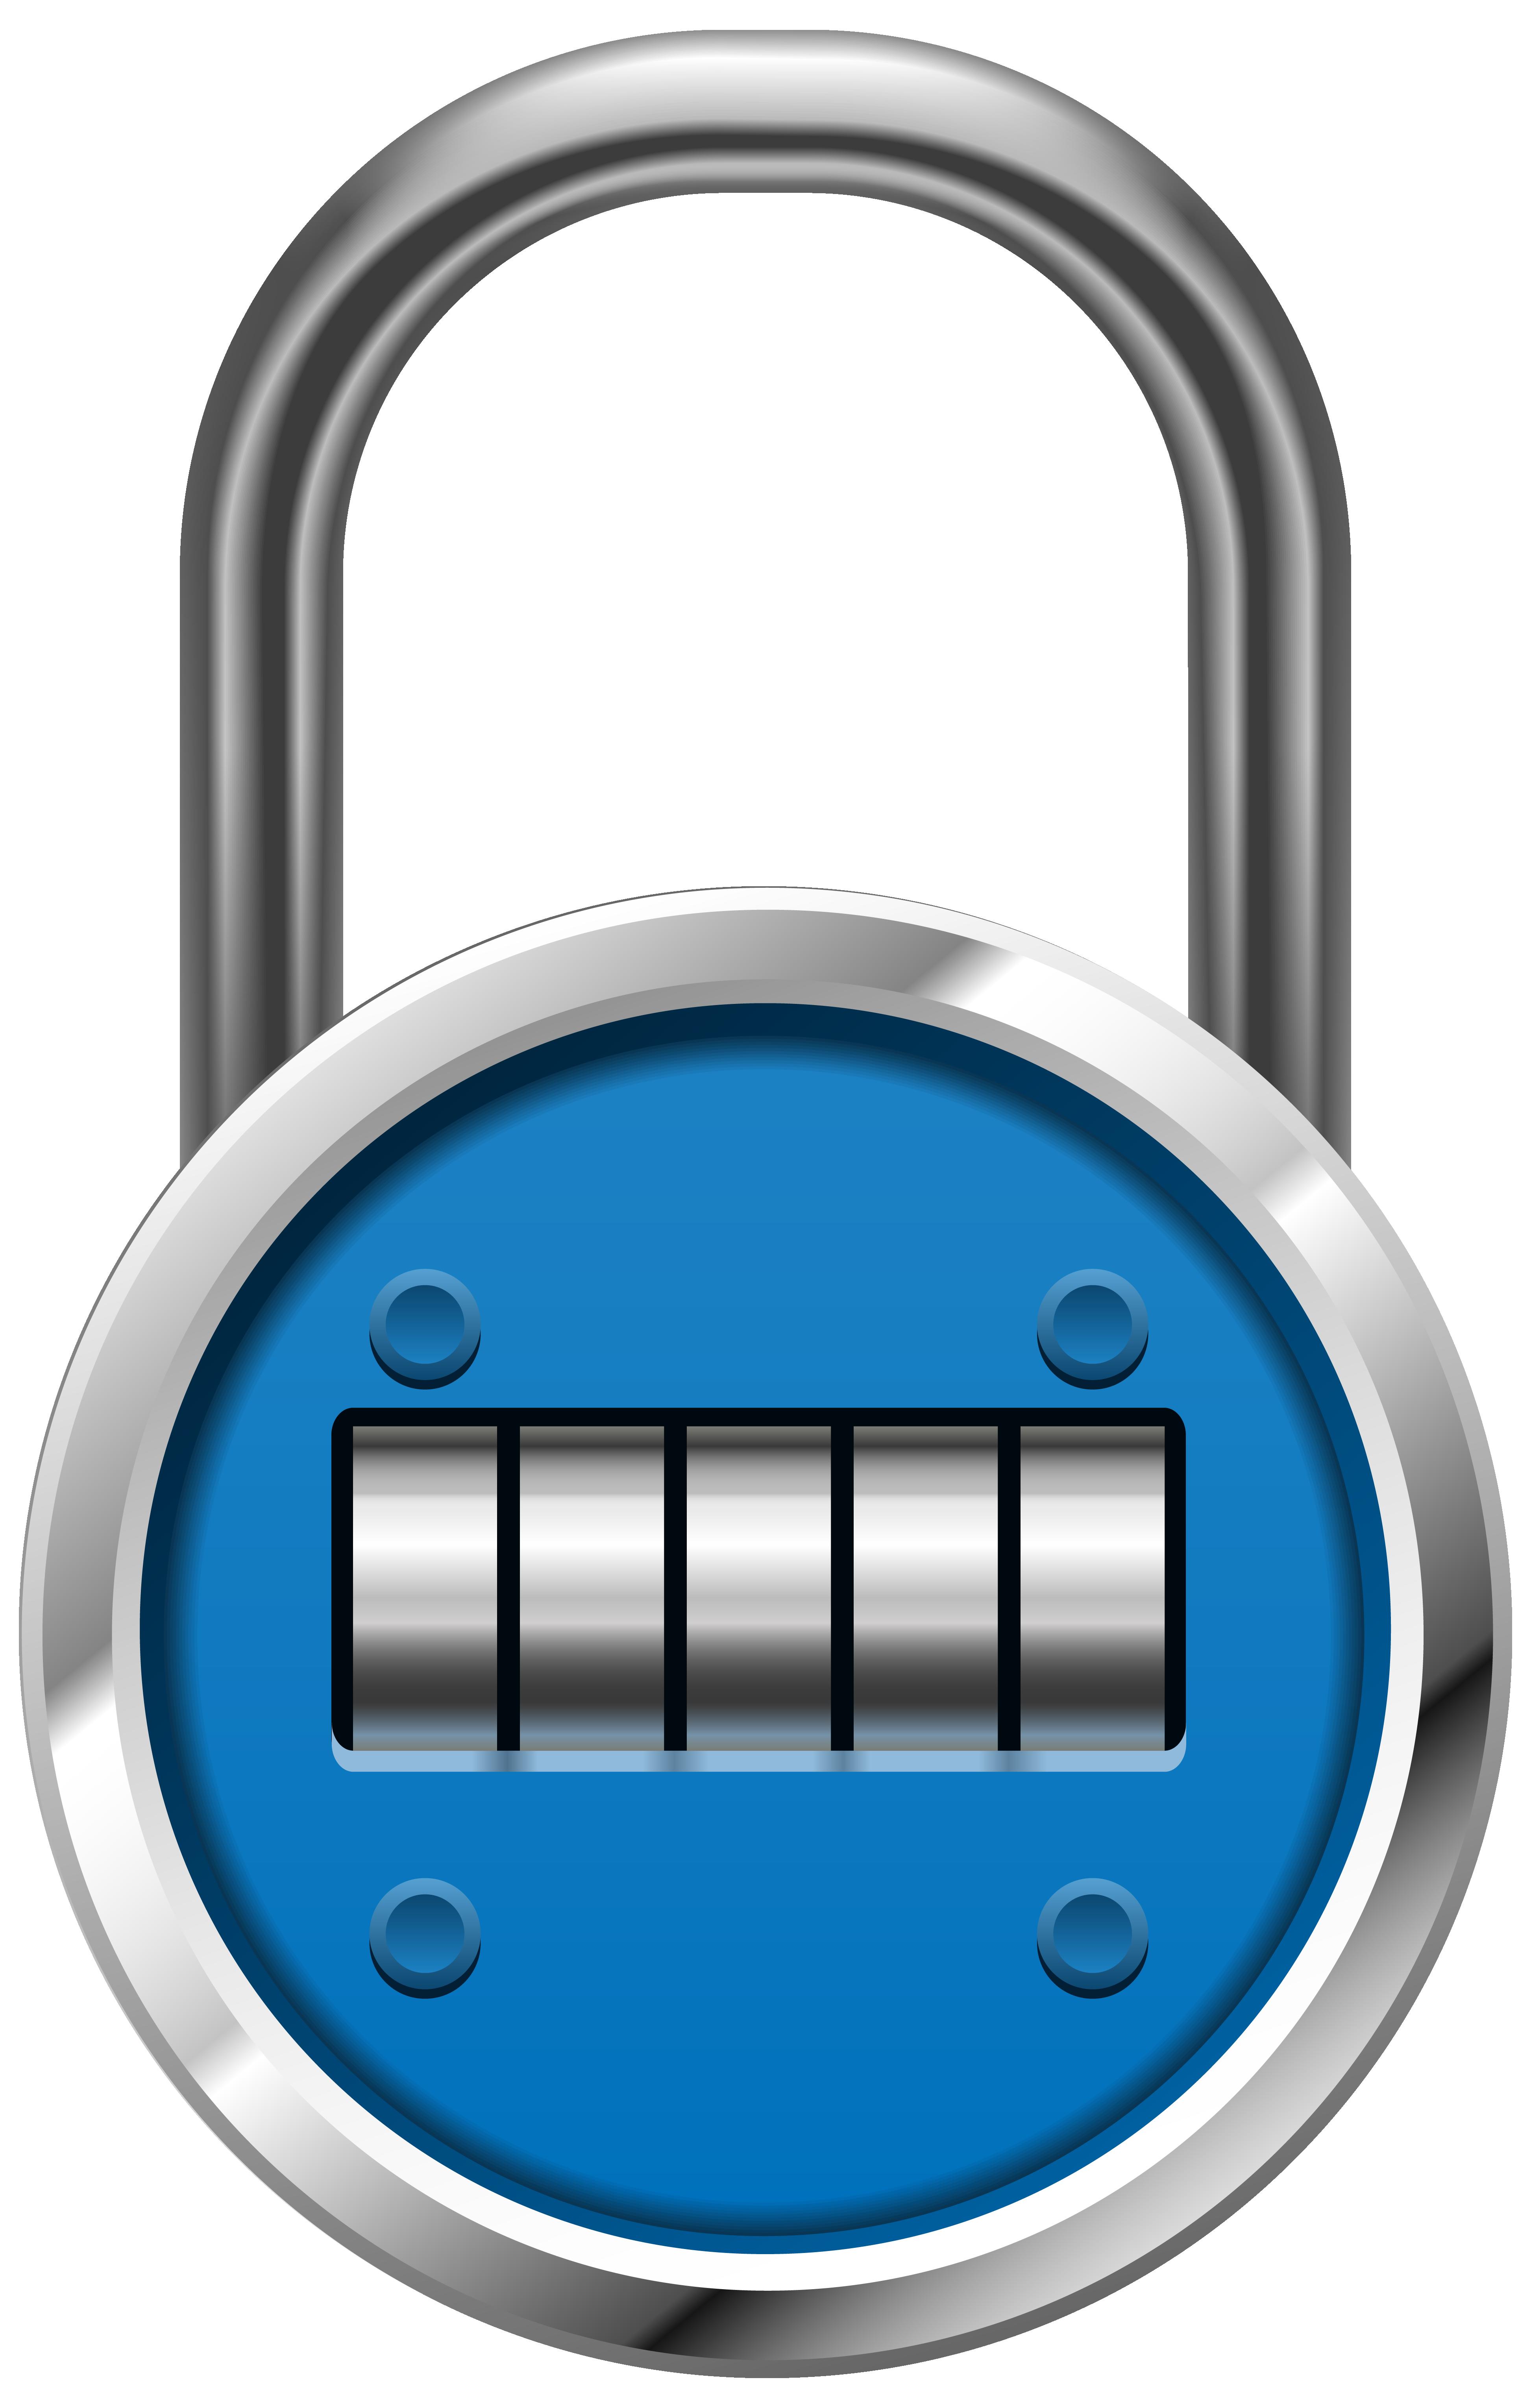 Blue padlock png clip. Money clipart lock